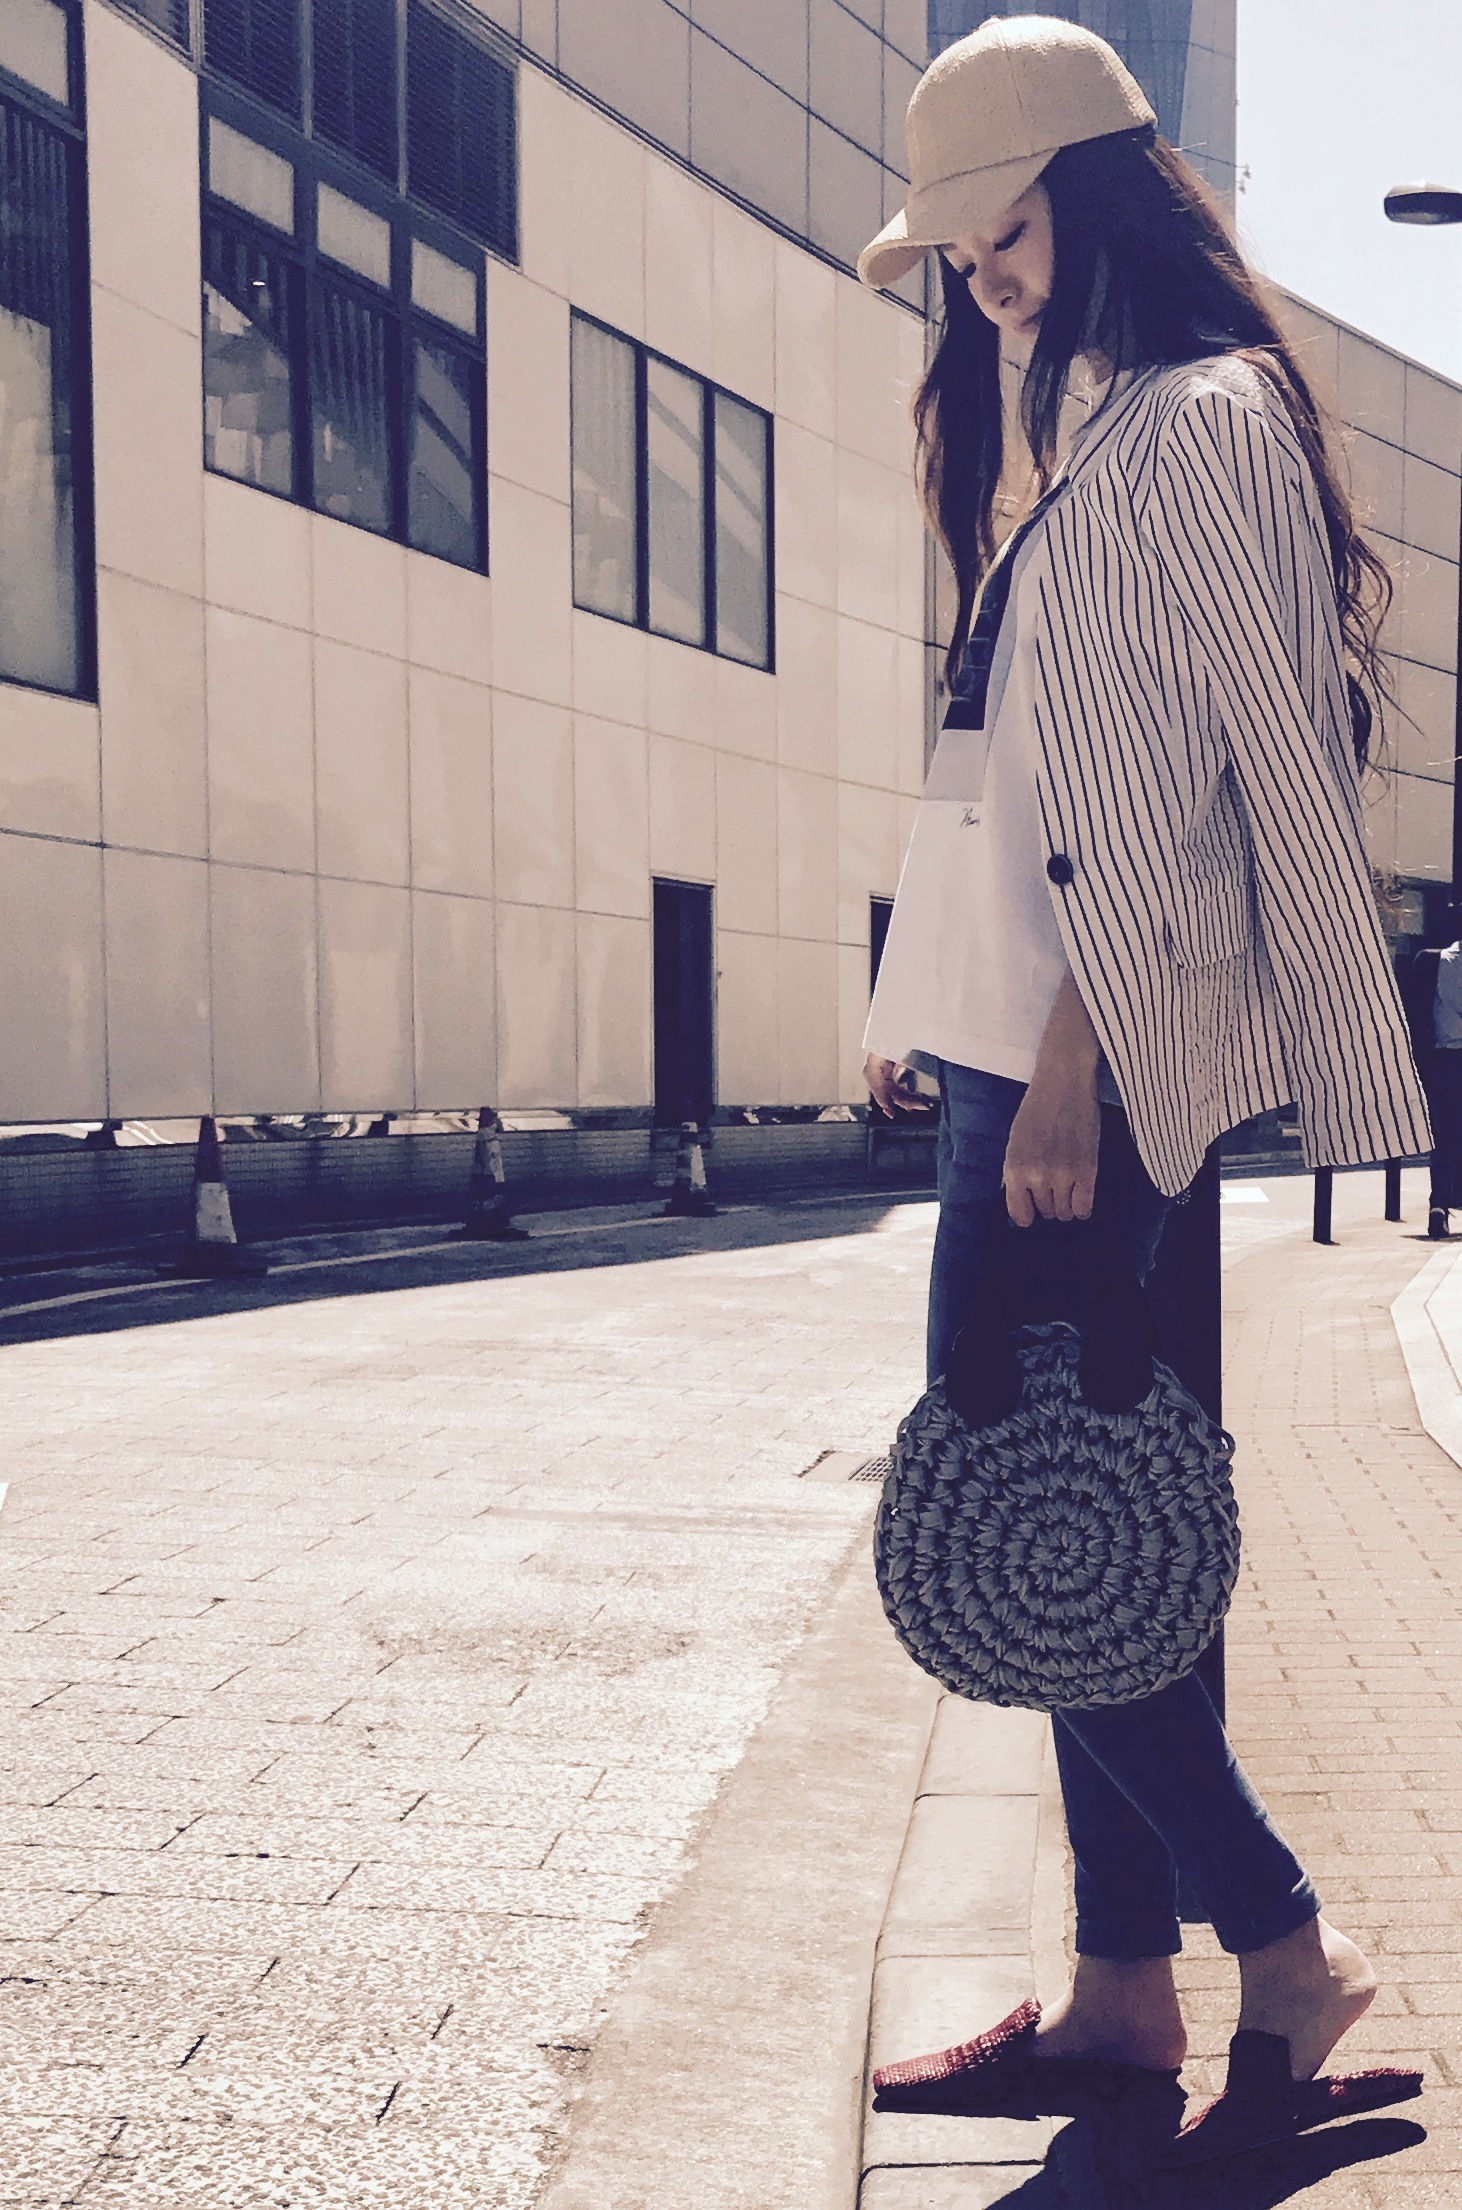 POMTATA Scrap Book ポンタタ スクラップブック 有楽町マルイ 可愛い bag バッグ knit bag ニットバッグ レザー持ち手 牛革ハンドル 軽い 日本製 ジャパンメイド タンポポ